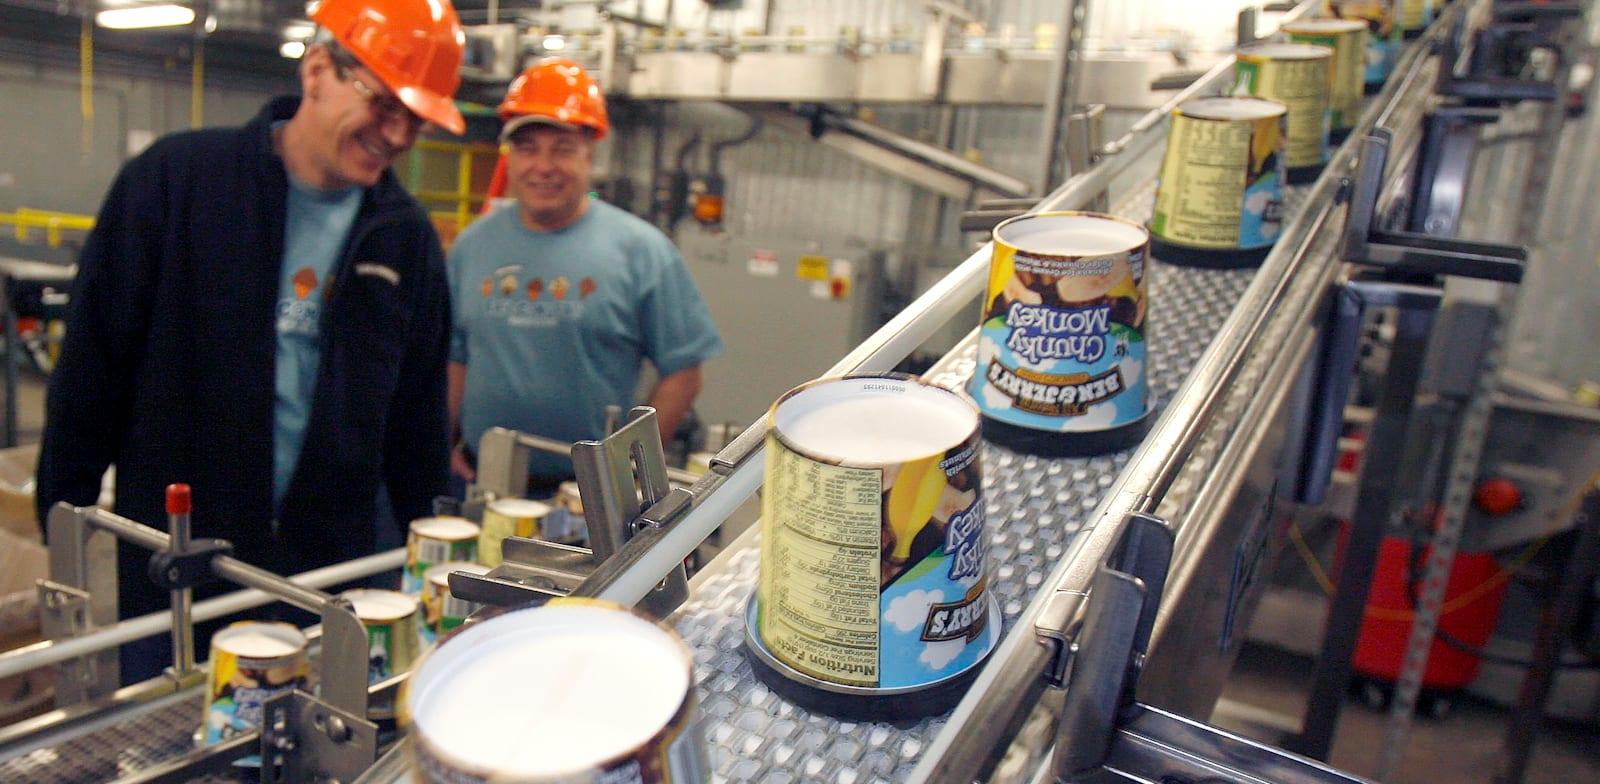 מפעל של בן אנד ג'ריס / צילום: Associated Press, Toby Talbot